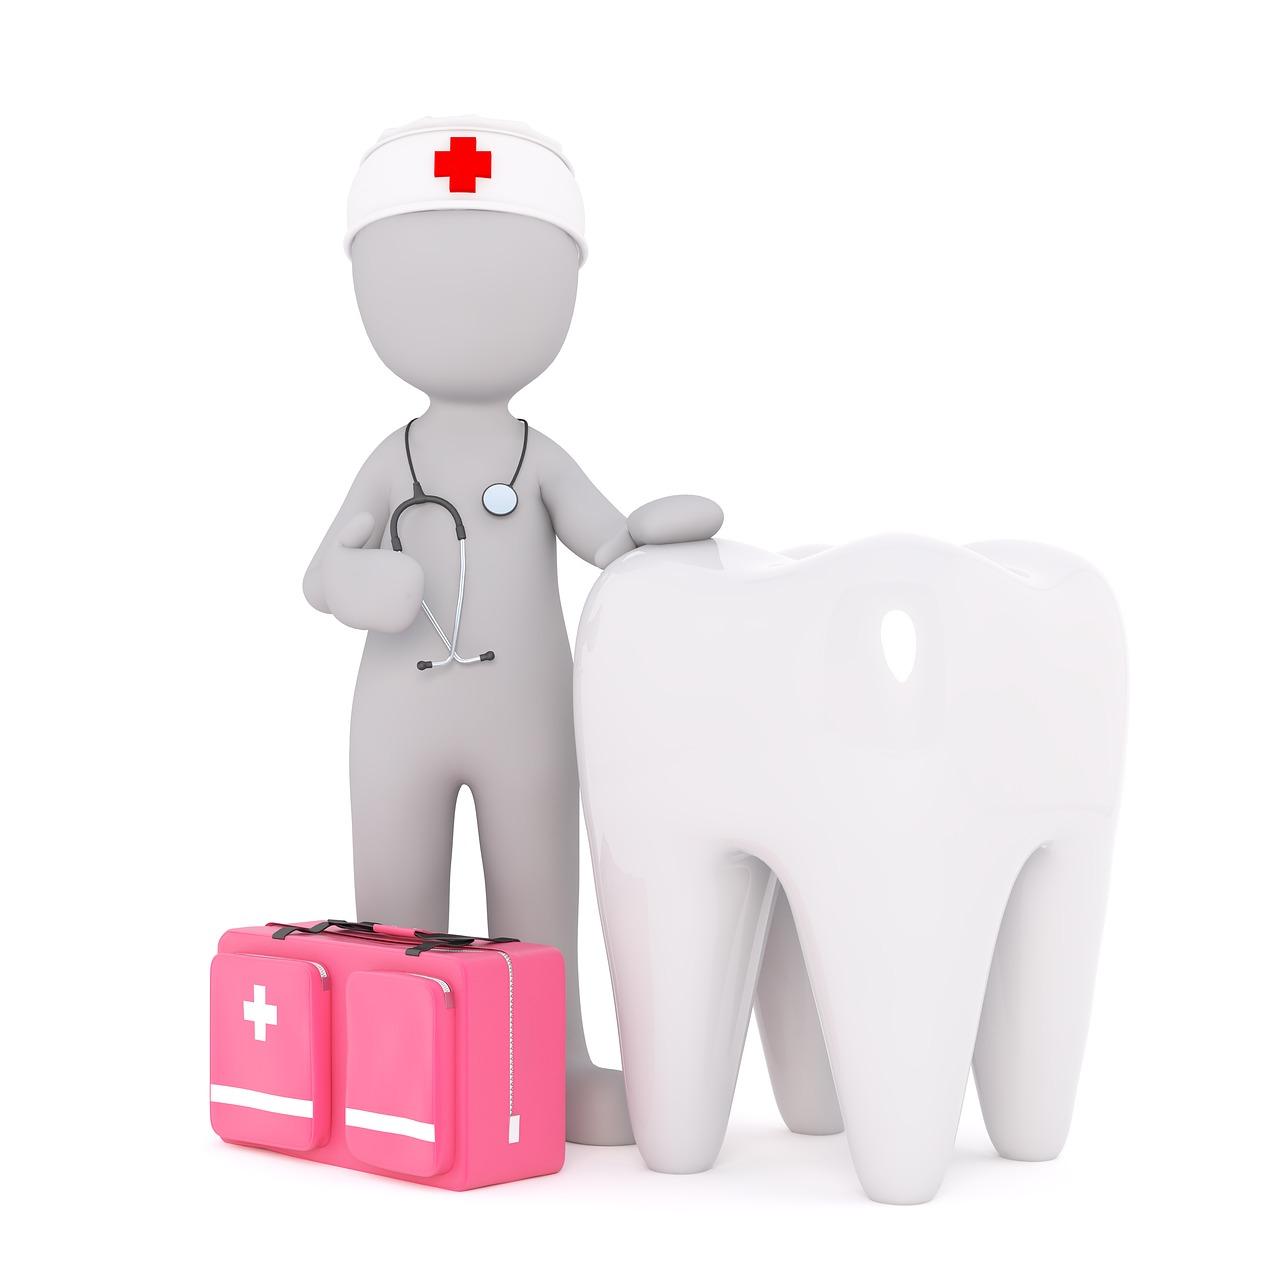 Protesi dentali hi-tech grazie al 3D